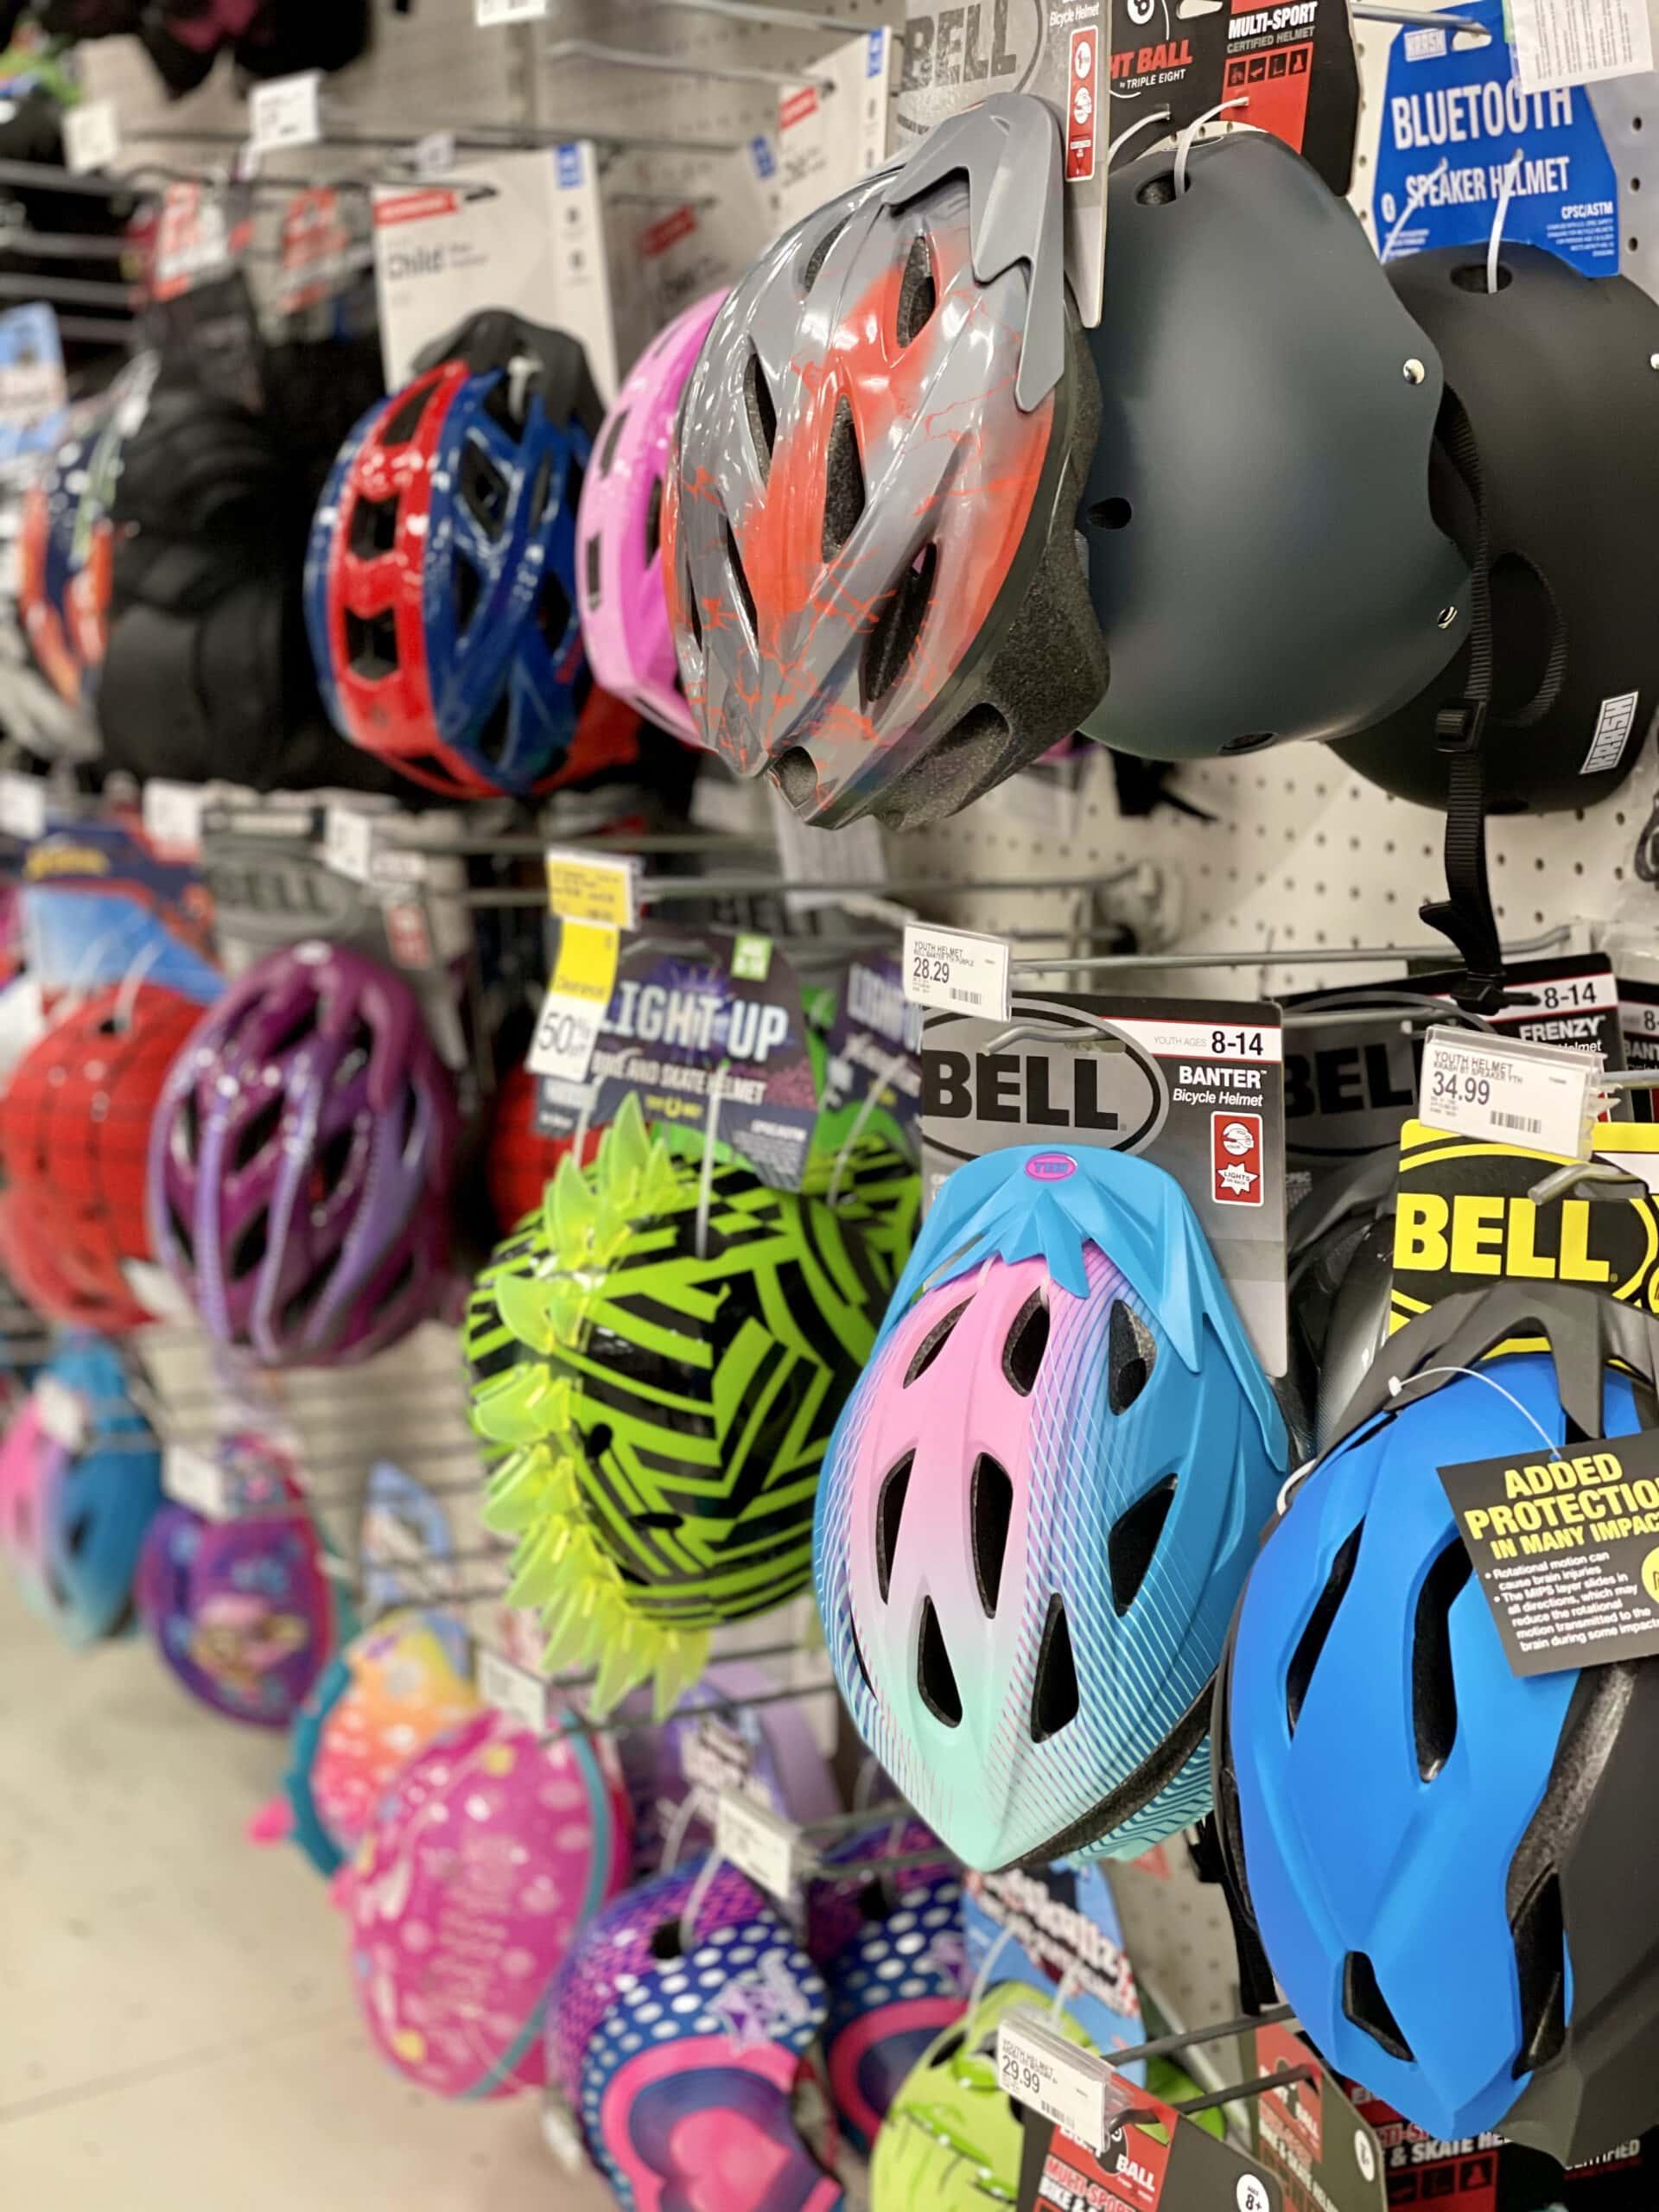 Walmart bikes and accessories